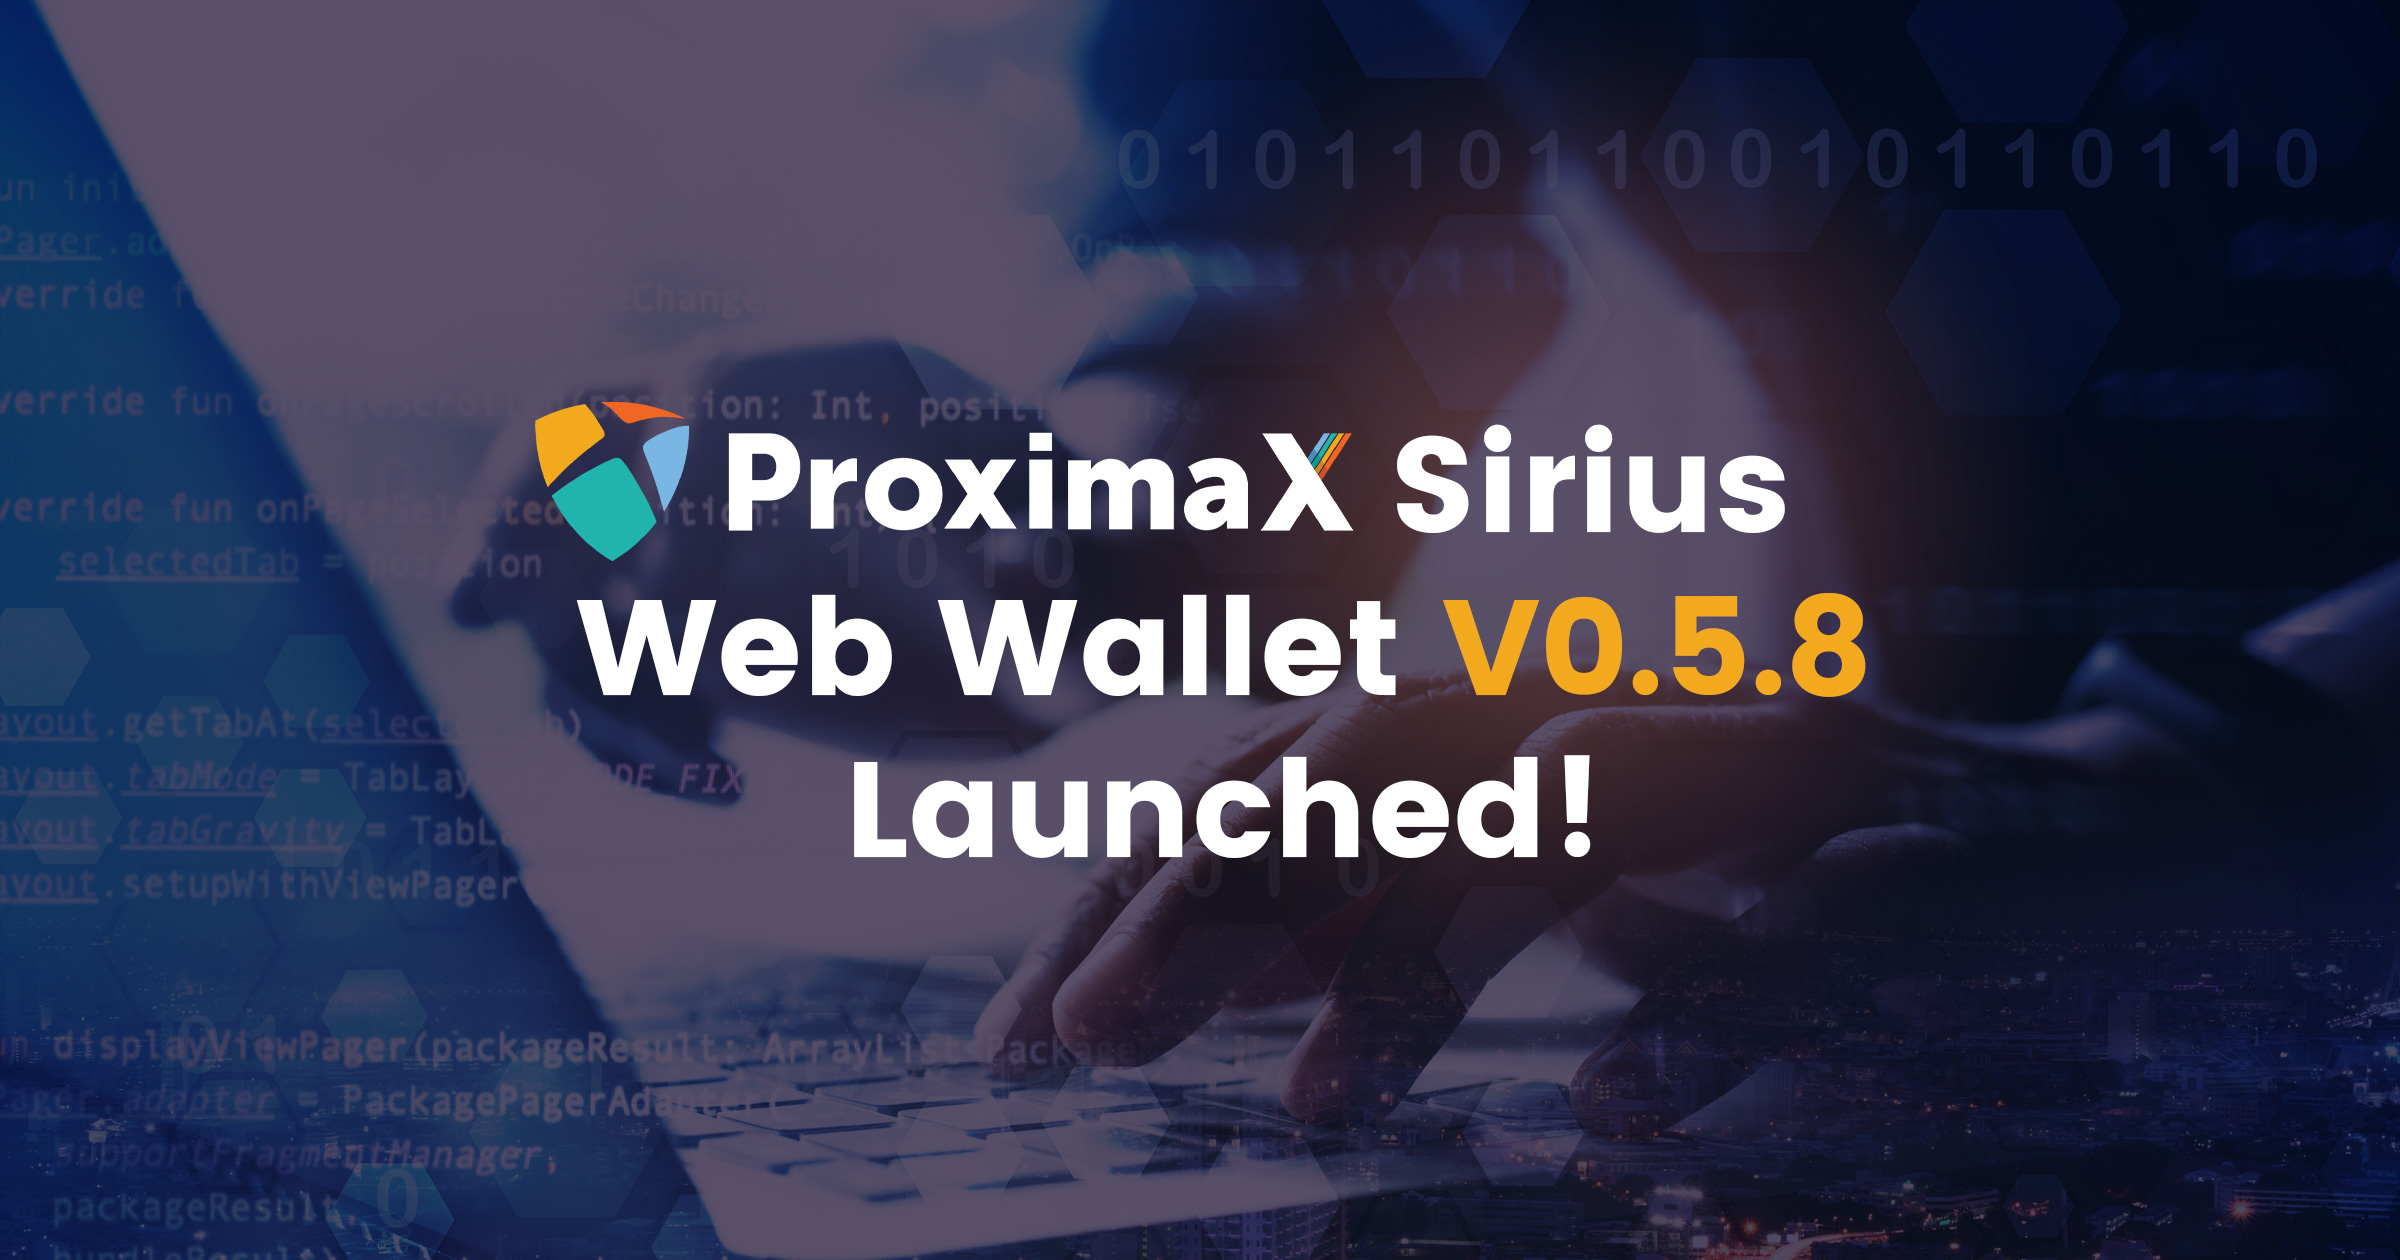 Запущена новая версия веб-кошелька ProximaX Sirius v0.5.8